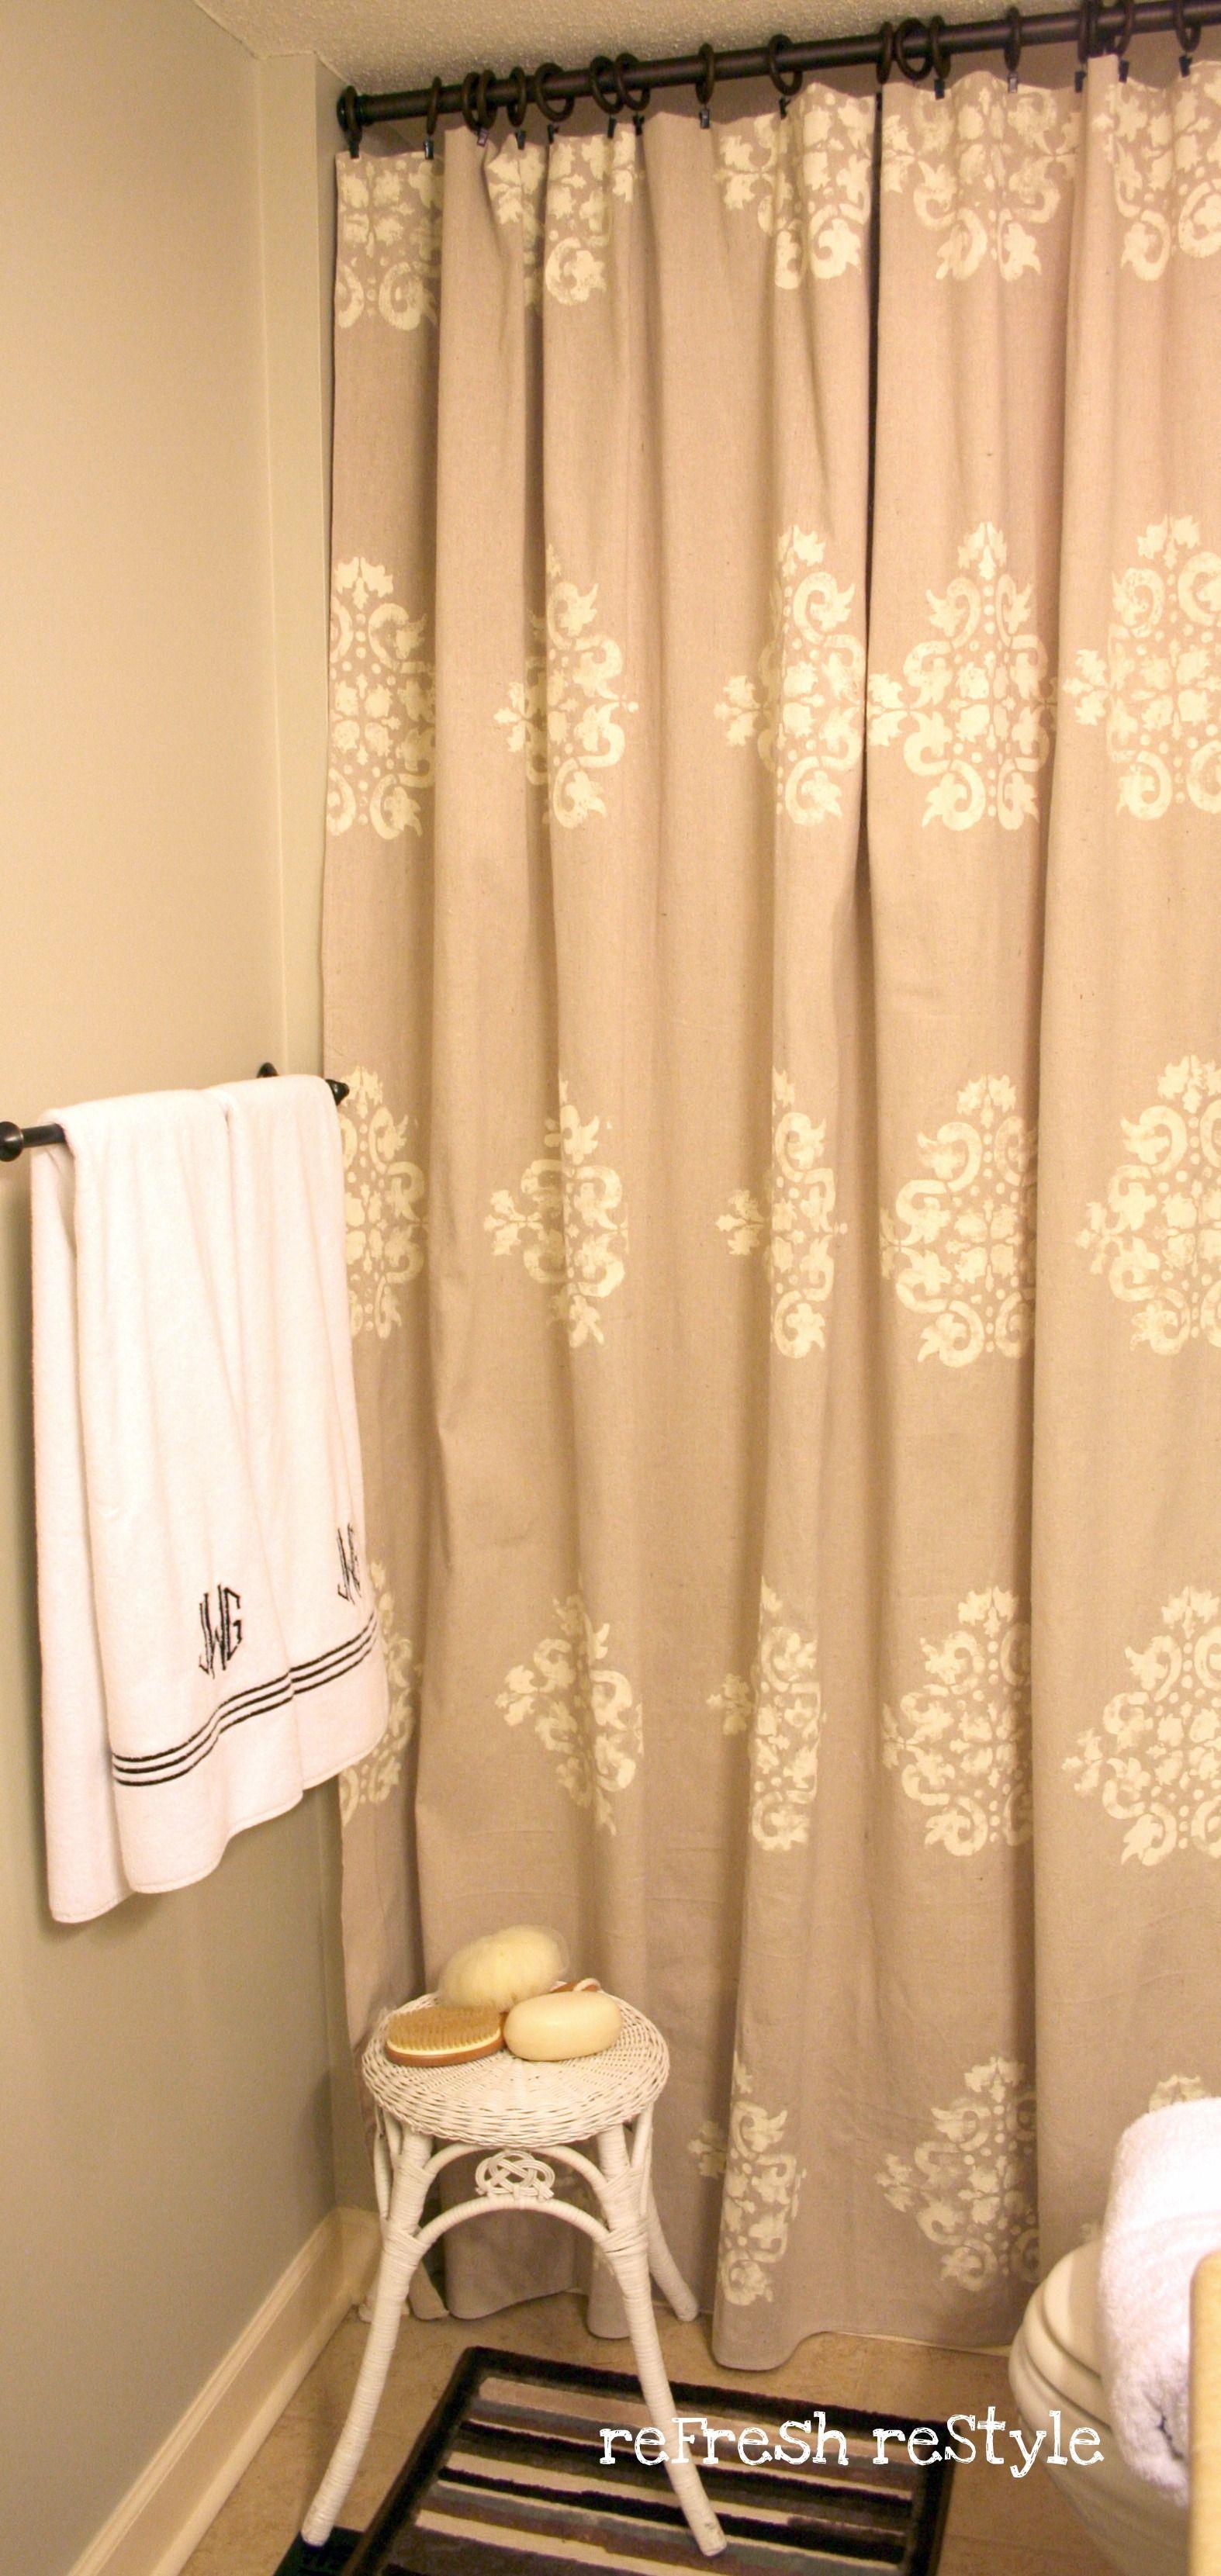 DIY Stencil Your Shower Curtain